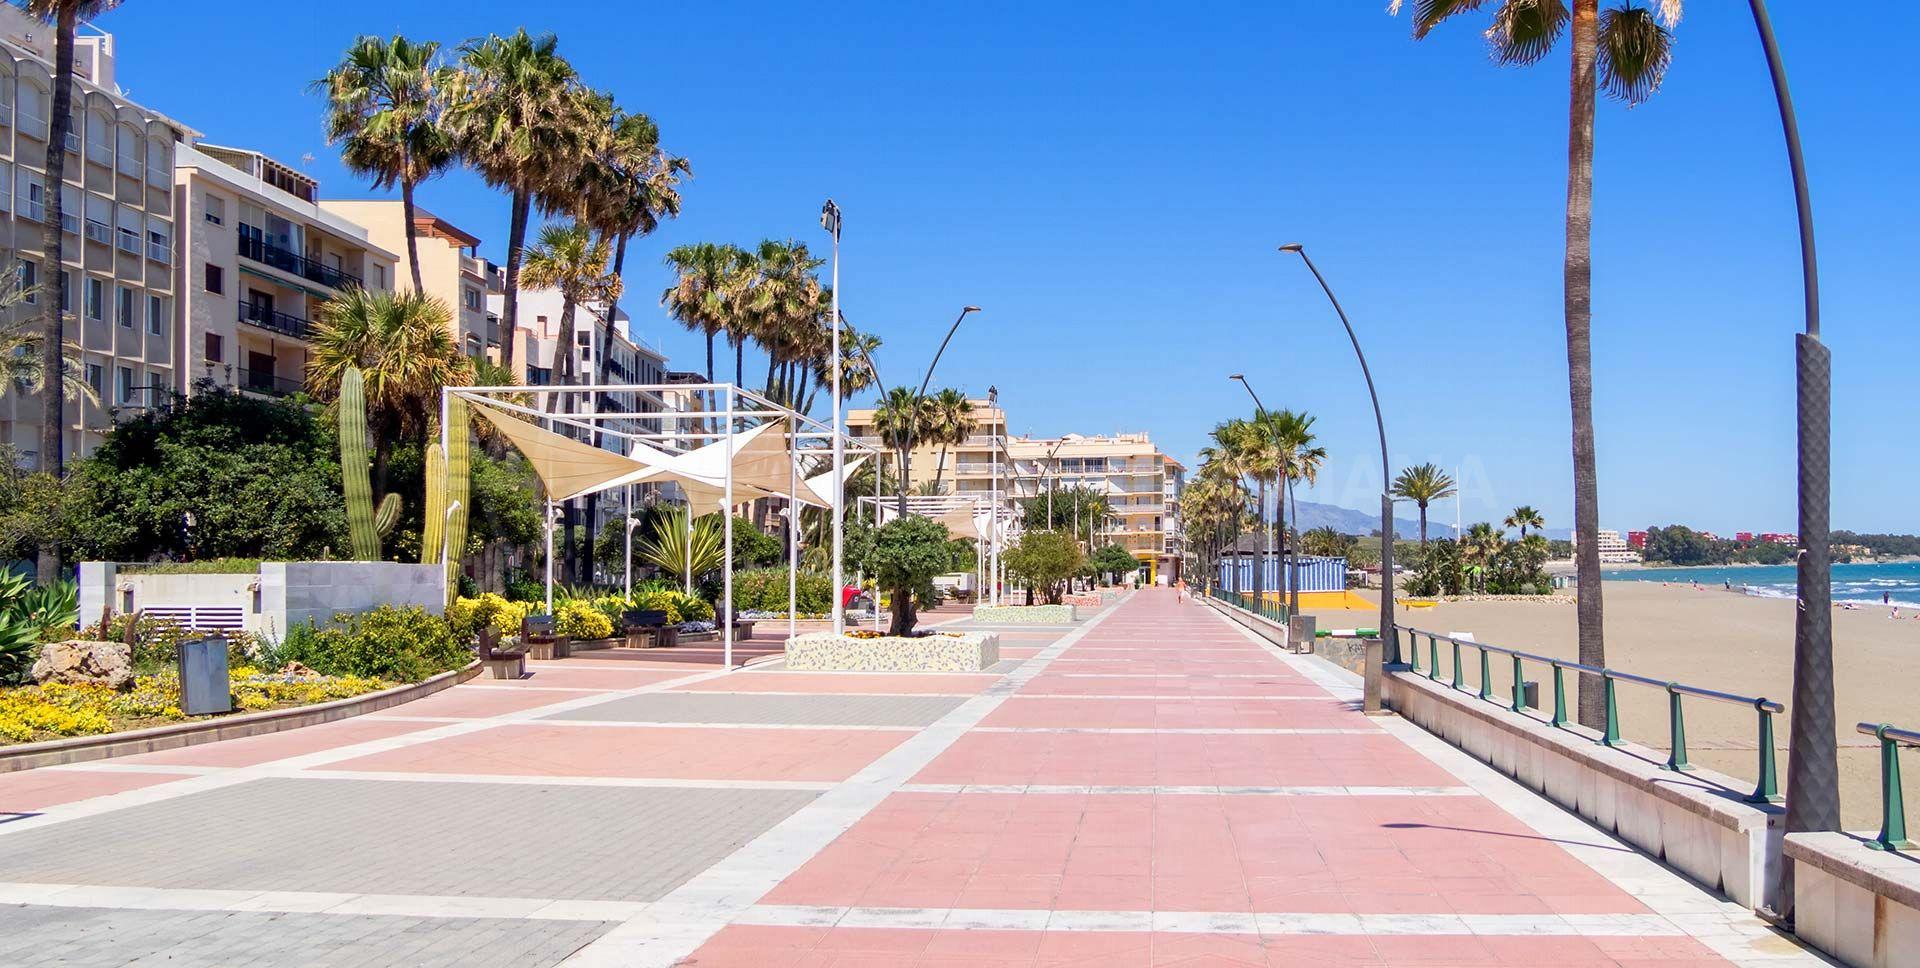 Guia de Estepona | Vivir en Estepona